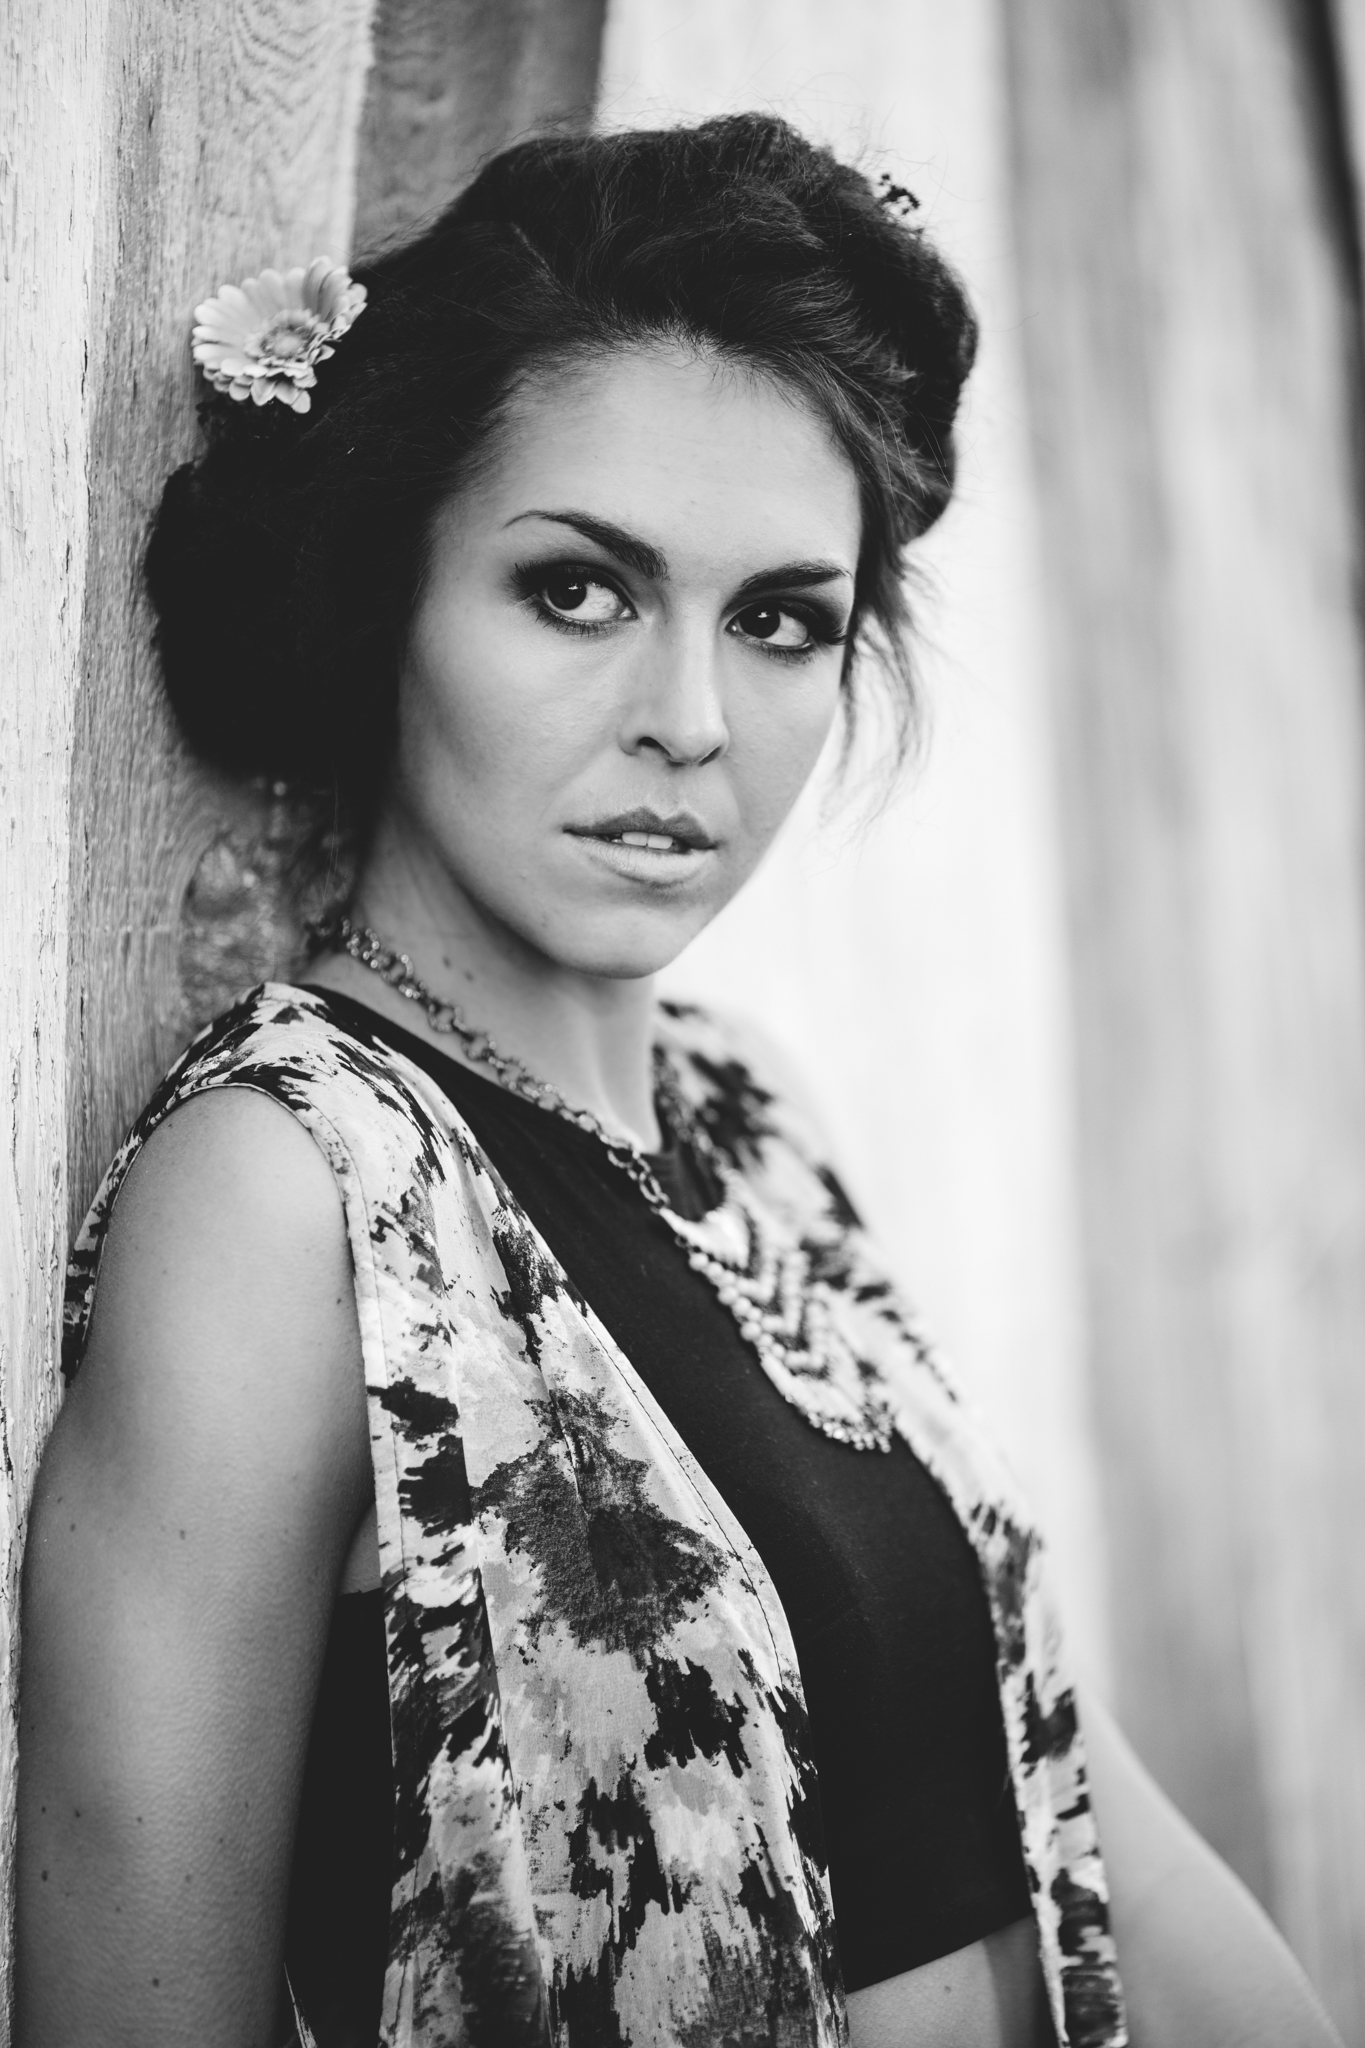 denver fashion photography (22 of 54)